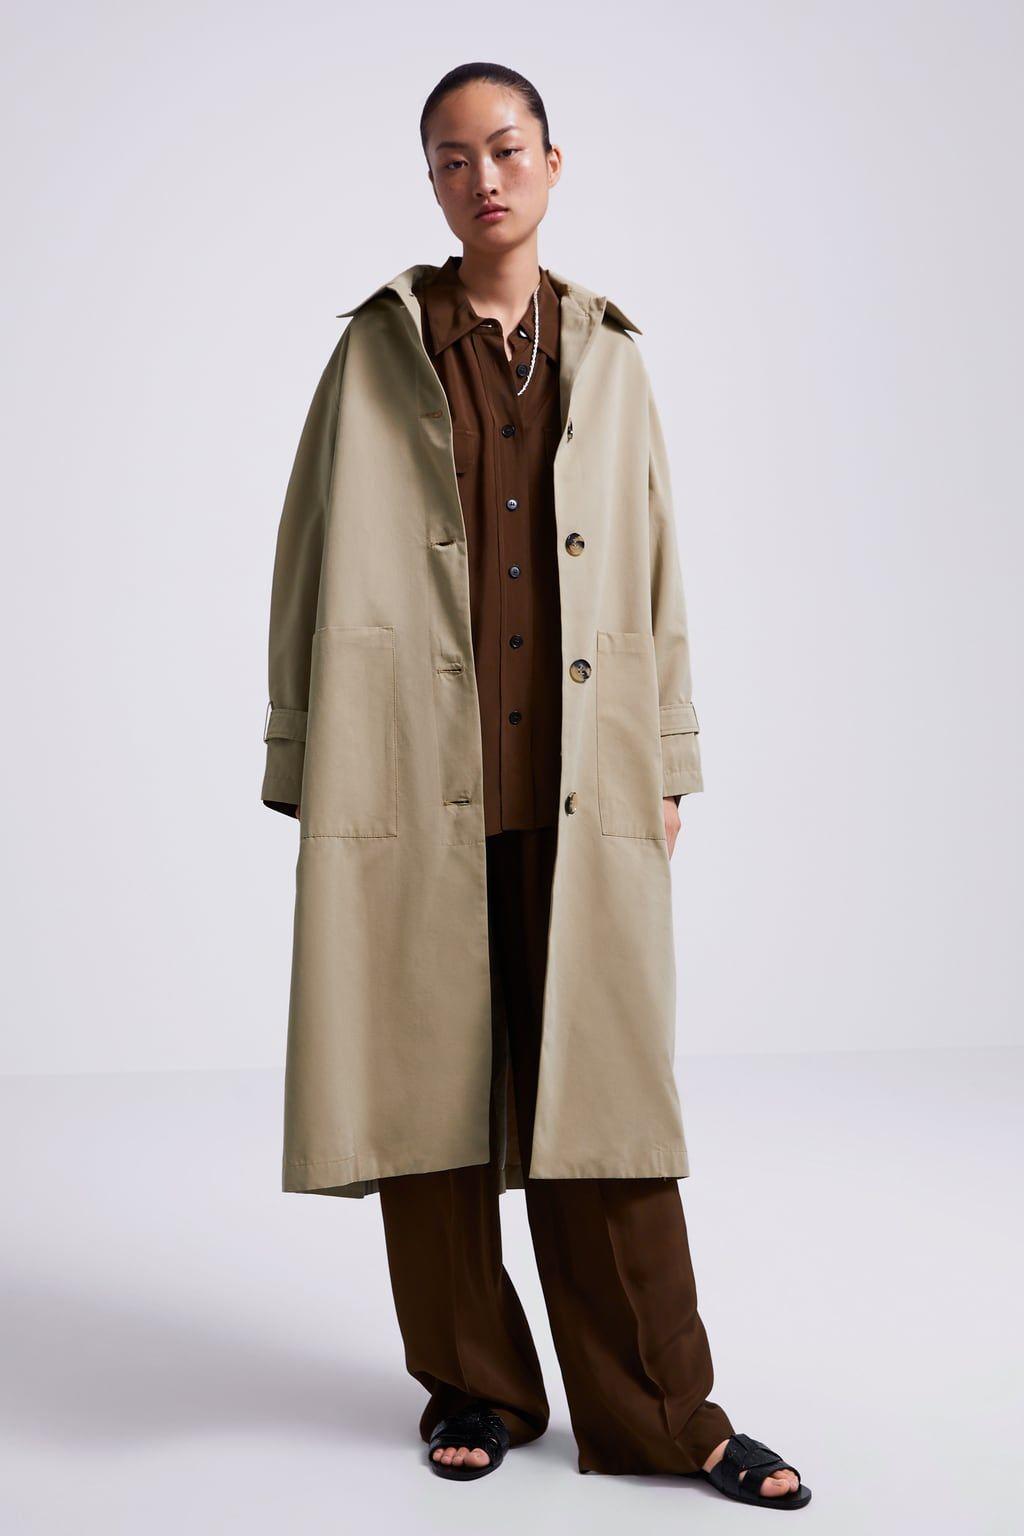 458e7948 Image 1 of OVERSIZED TRENCH COAT from Zara Trenchcoats, Zara Dresses, Zara  United Kingdom